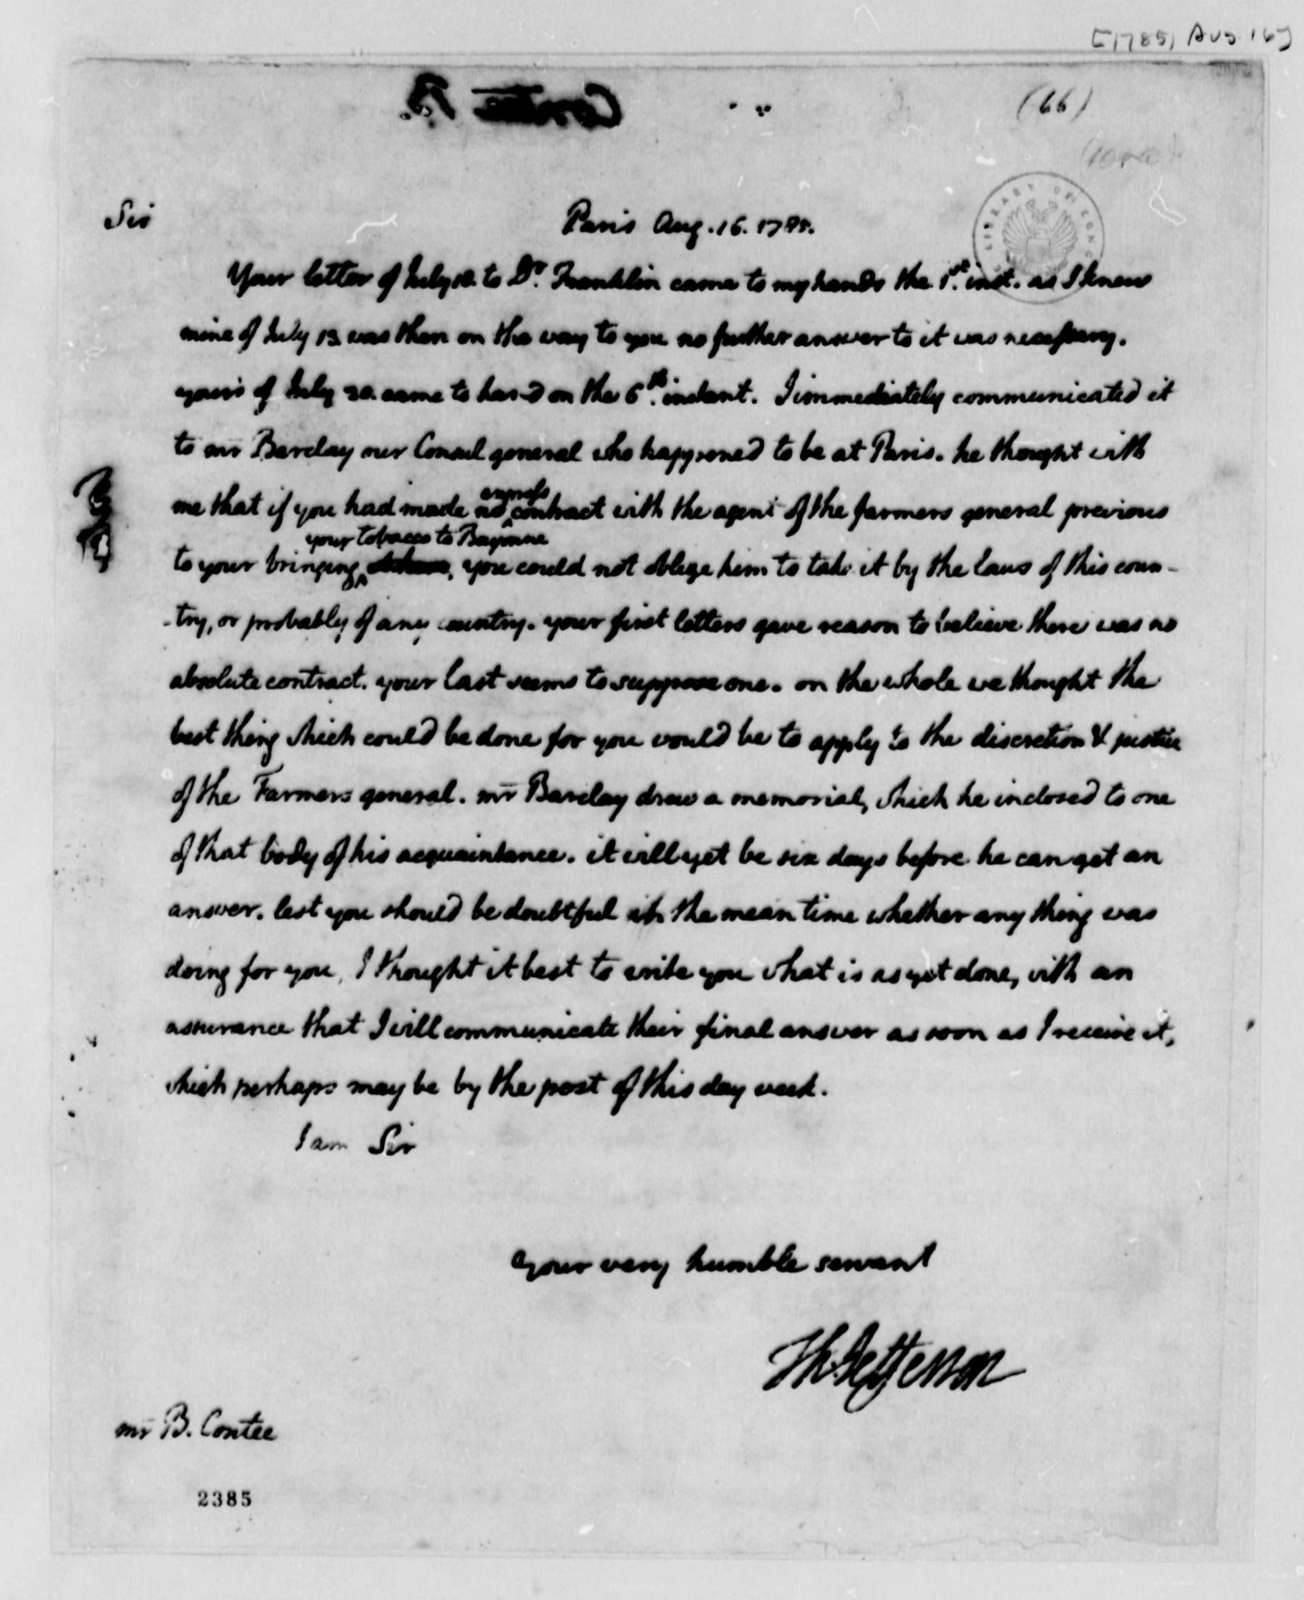 Thomas Jefferson to B. Contee, August 16, 1785